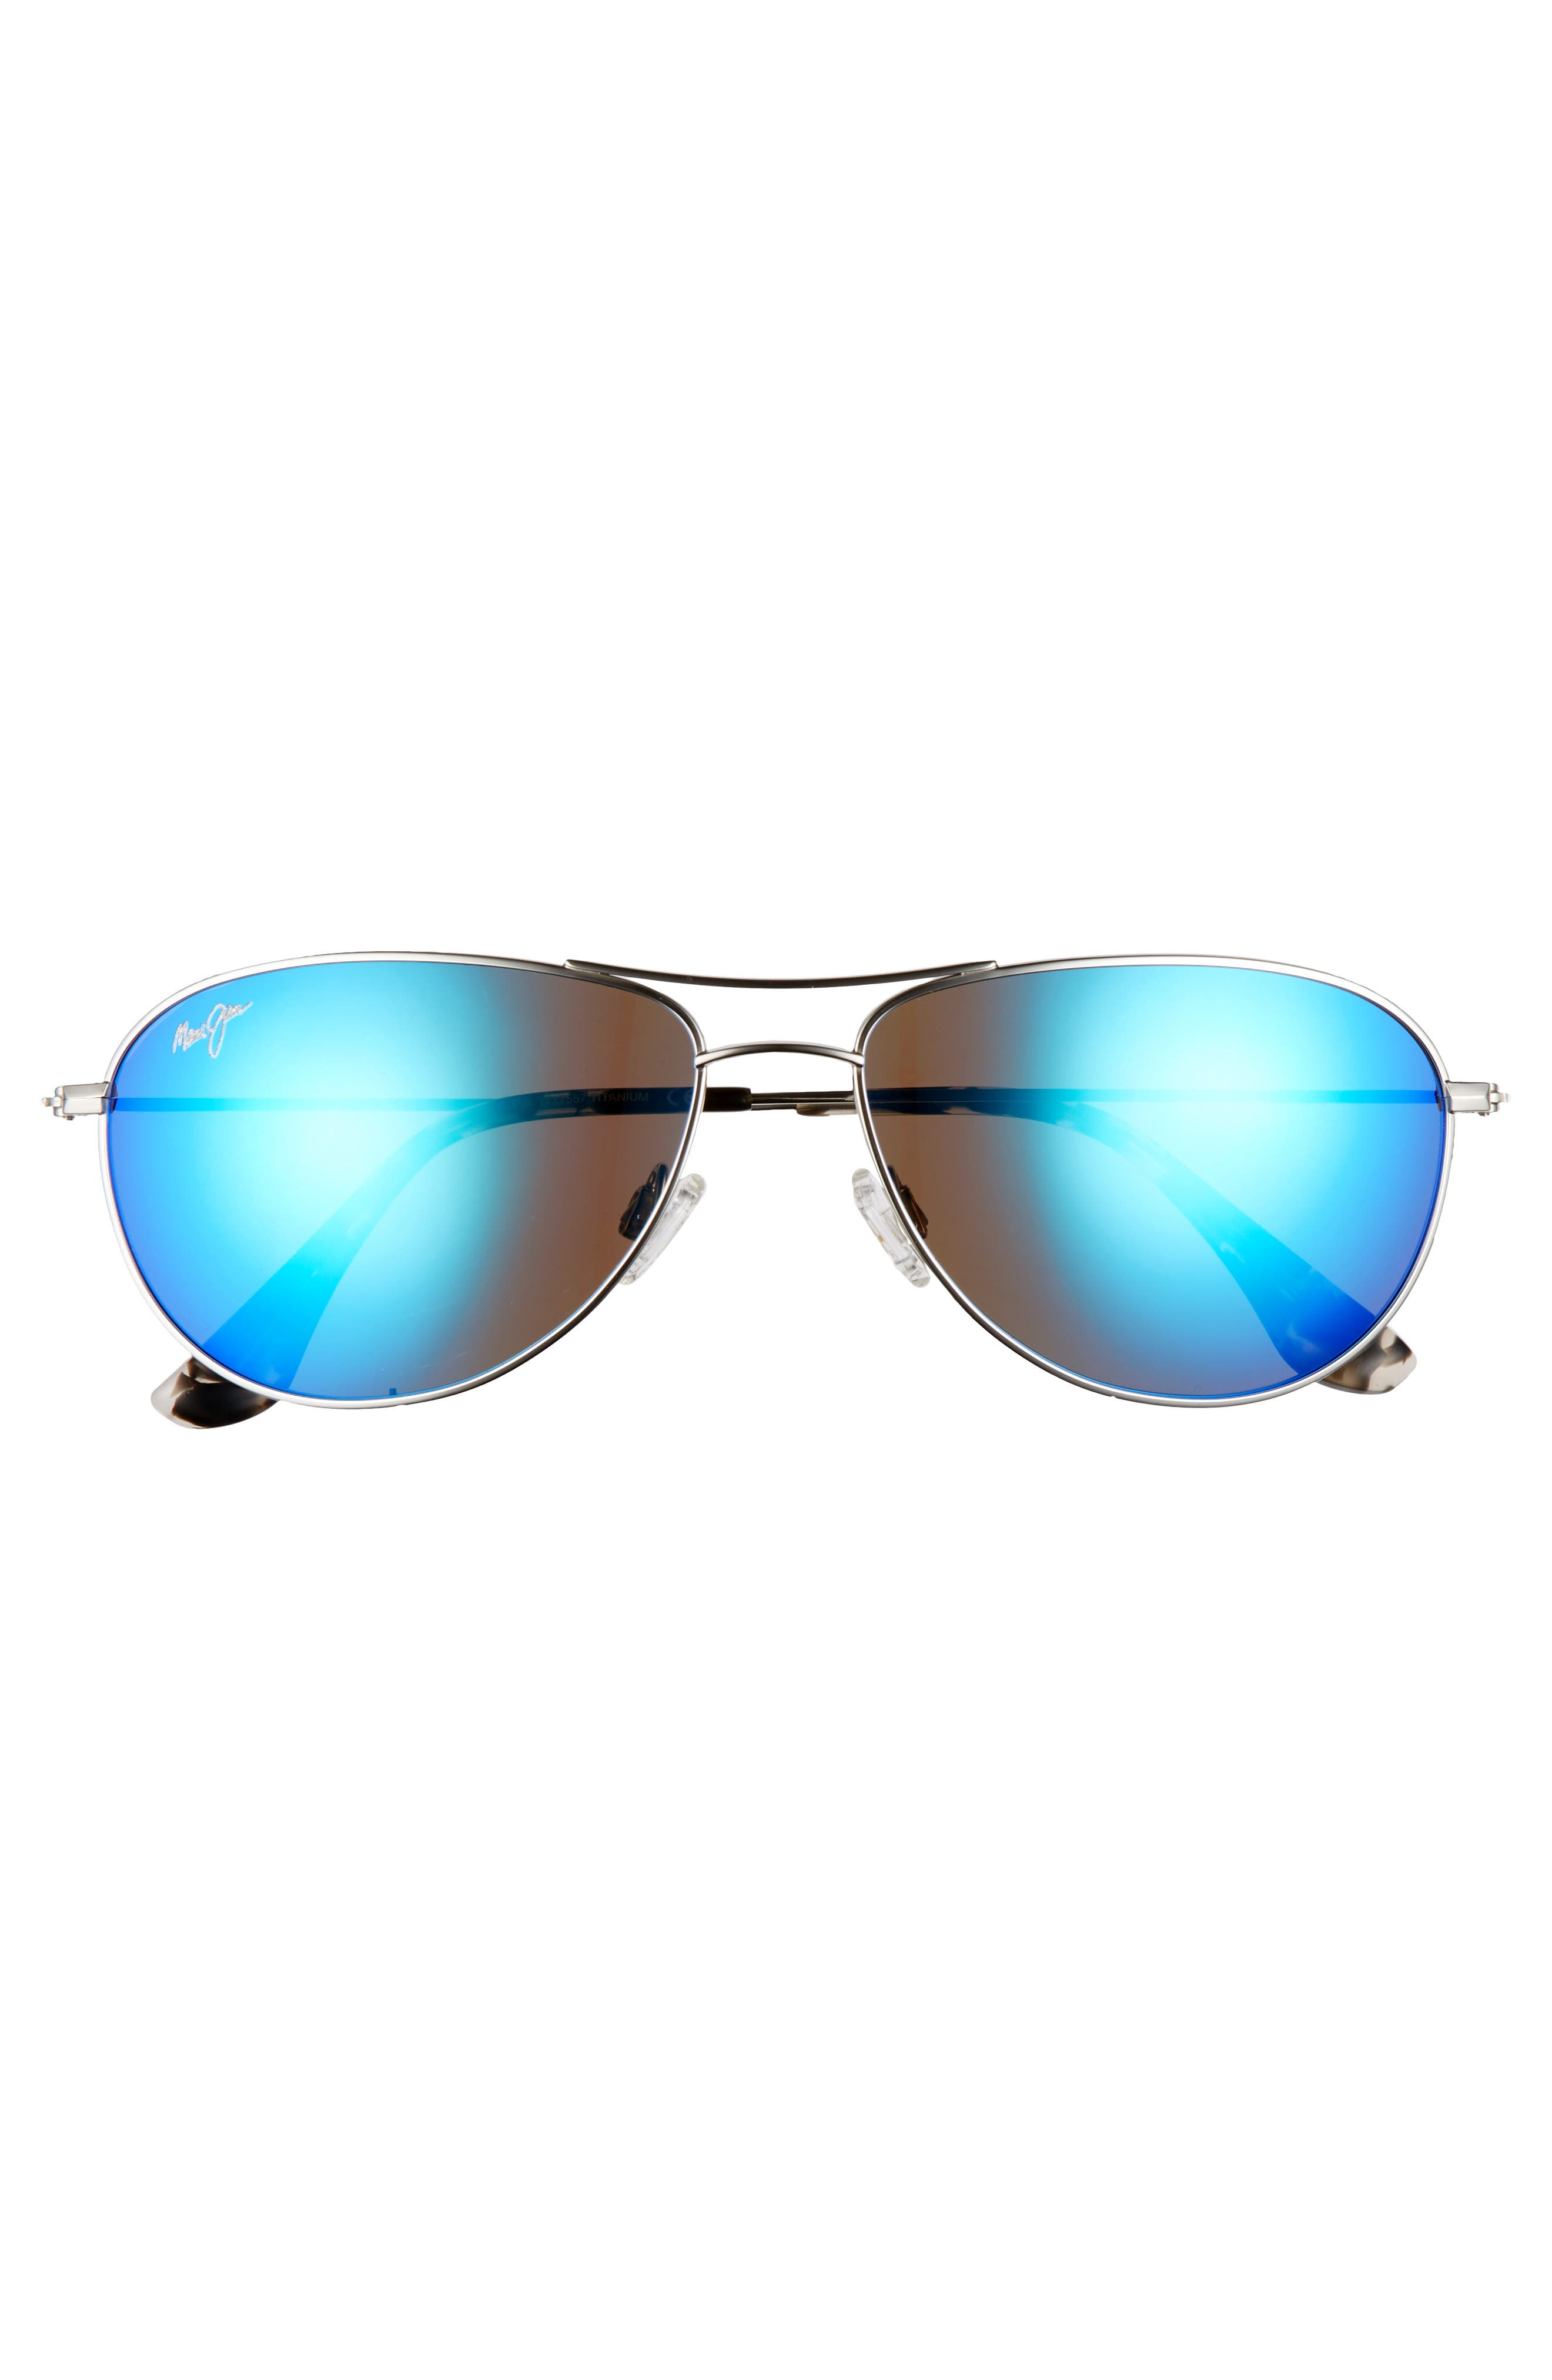 Sea House 60mm Polarized Titanium Aviator Sunglasses,                             Alternate thumbnail 3, color,                             SILVER/ BLUE HAWAII